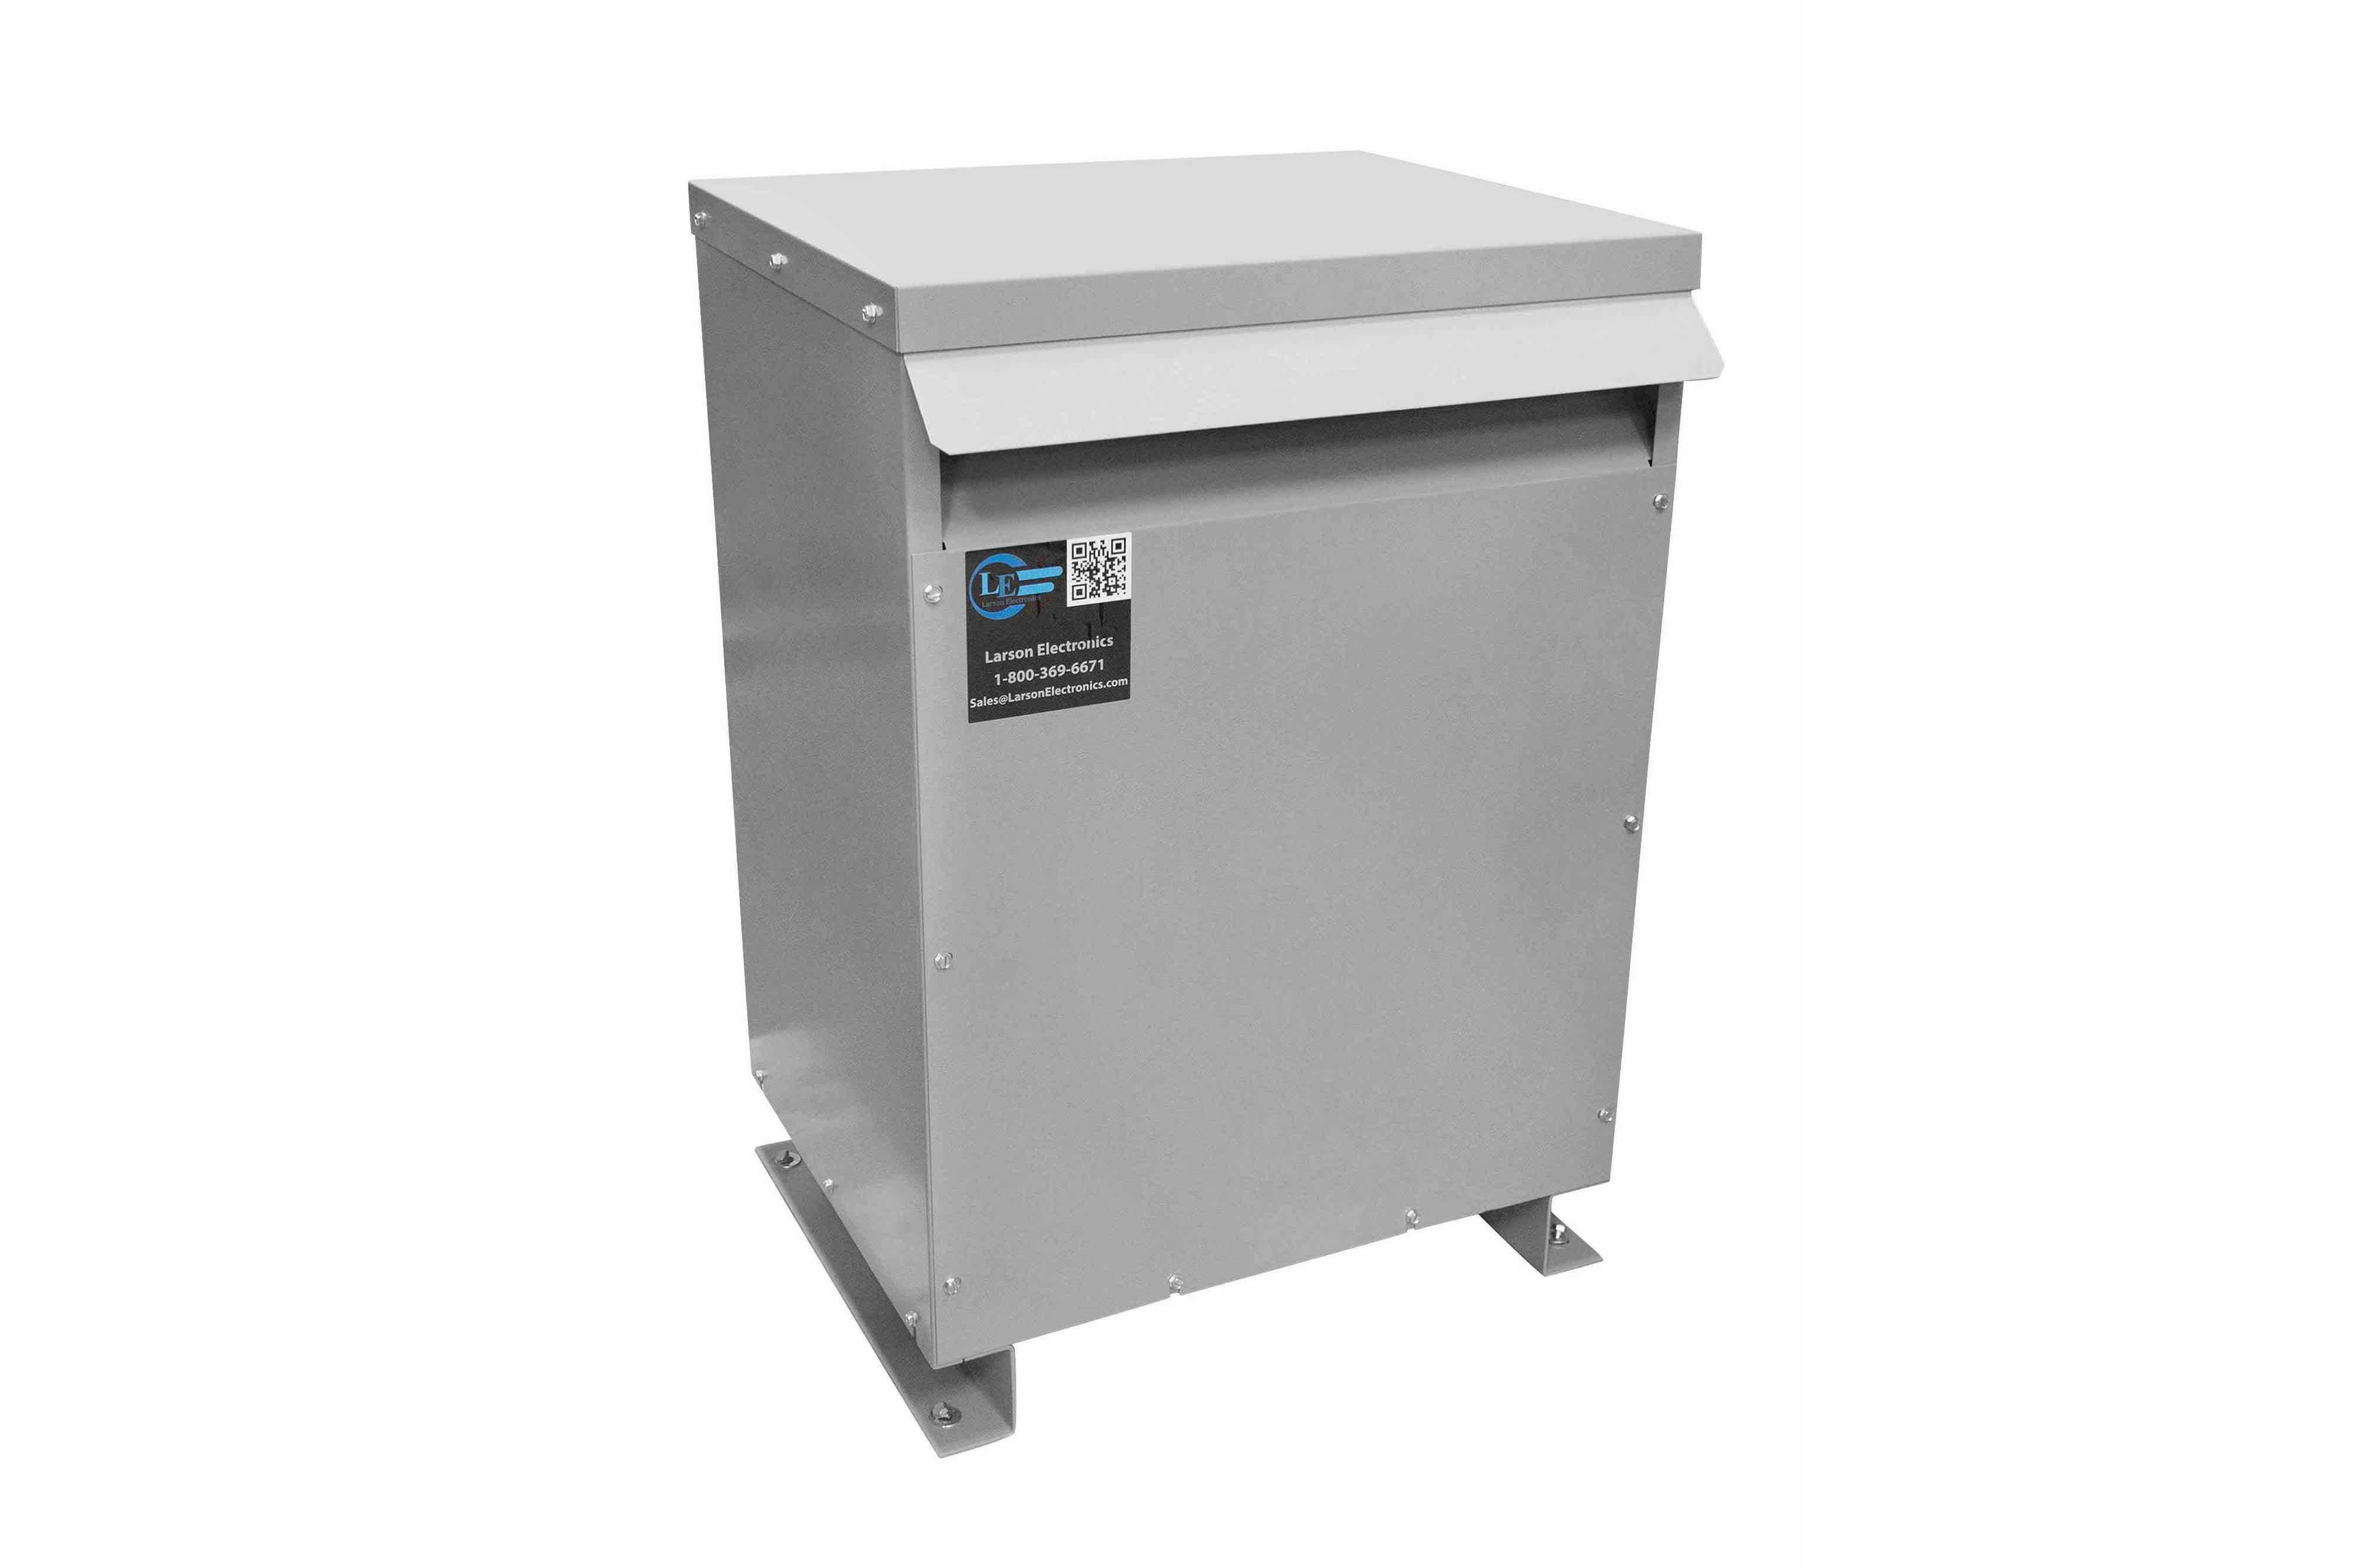 500 kVA 3PH Isolation Transformer, 380V Wye Primary, 480V Delta Secondary, N3R, Ventilated, 60 Hz